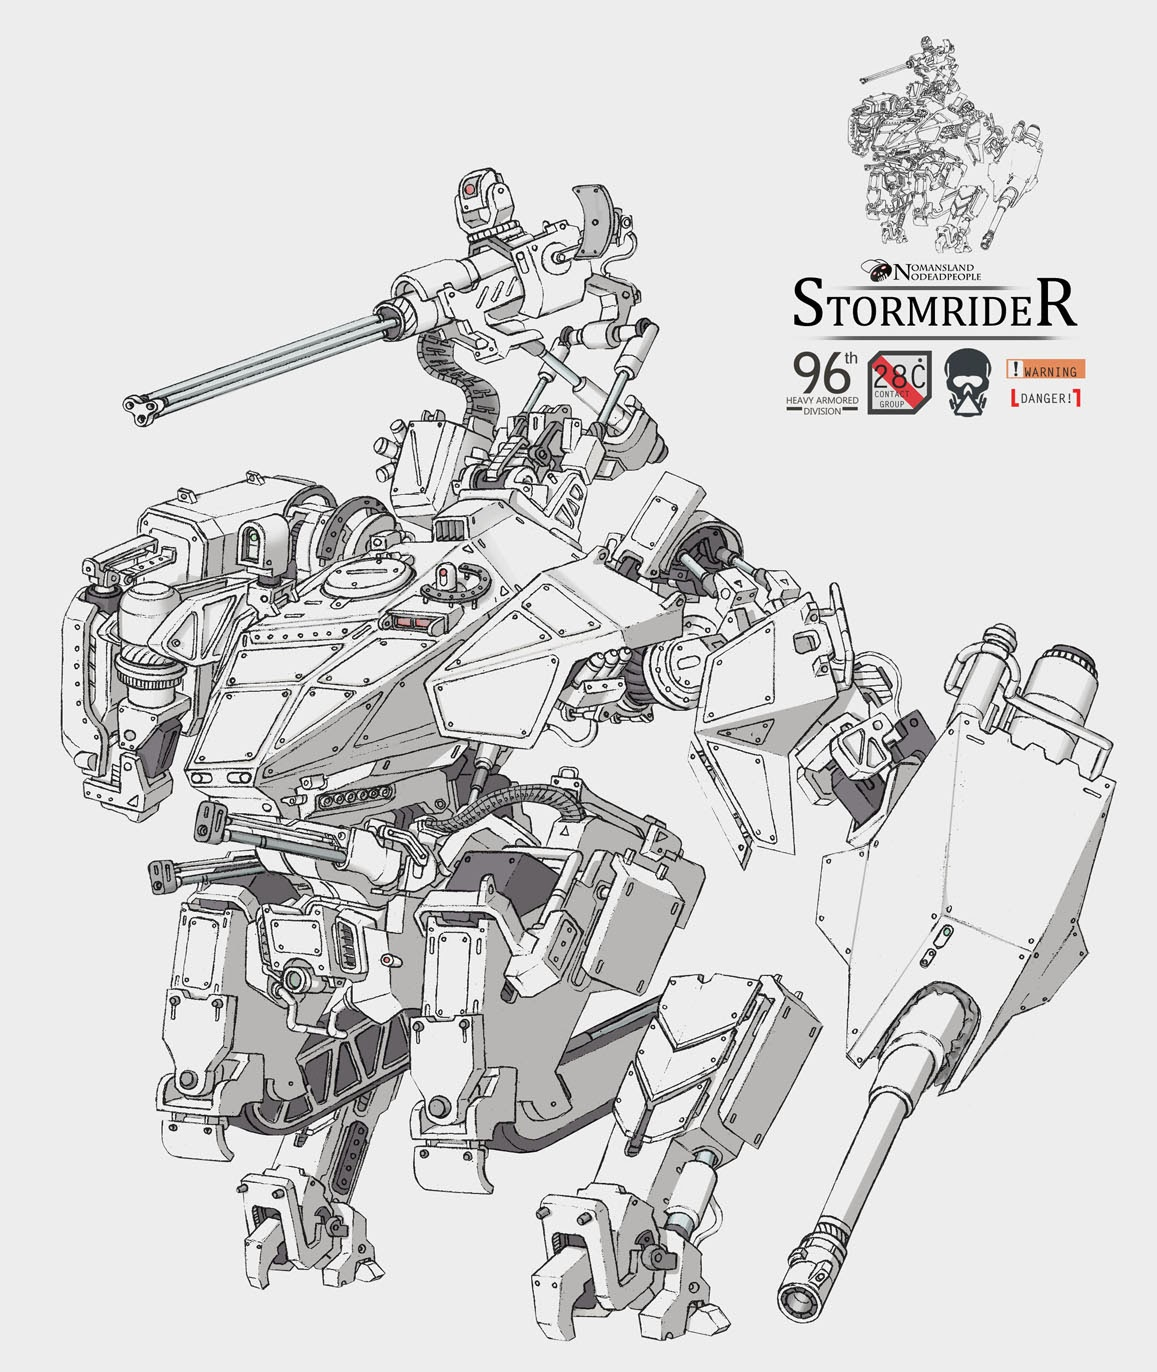 Nomansnodead Stormrider